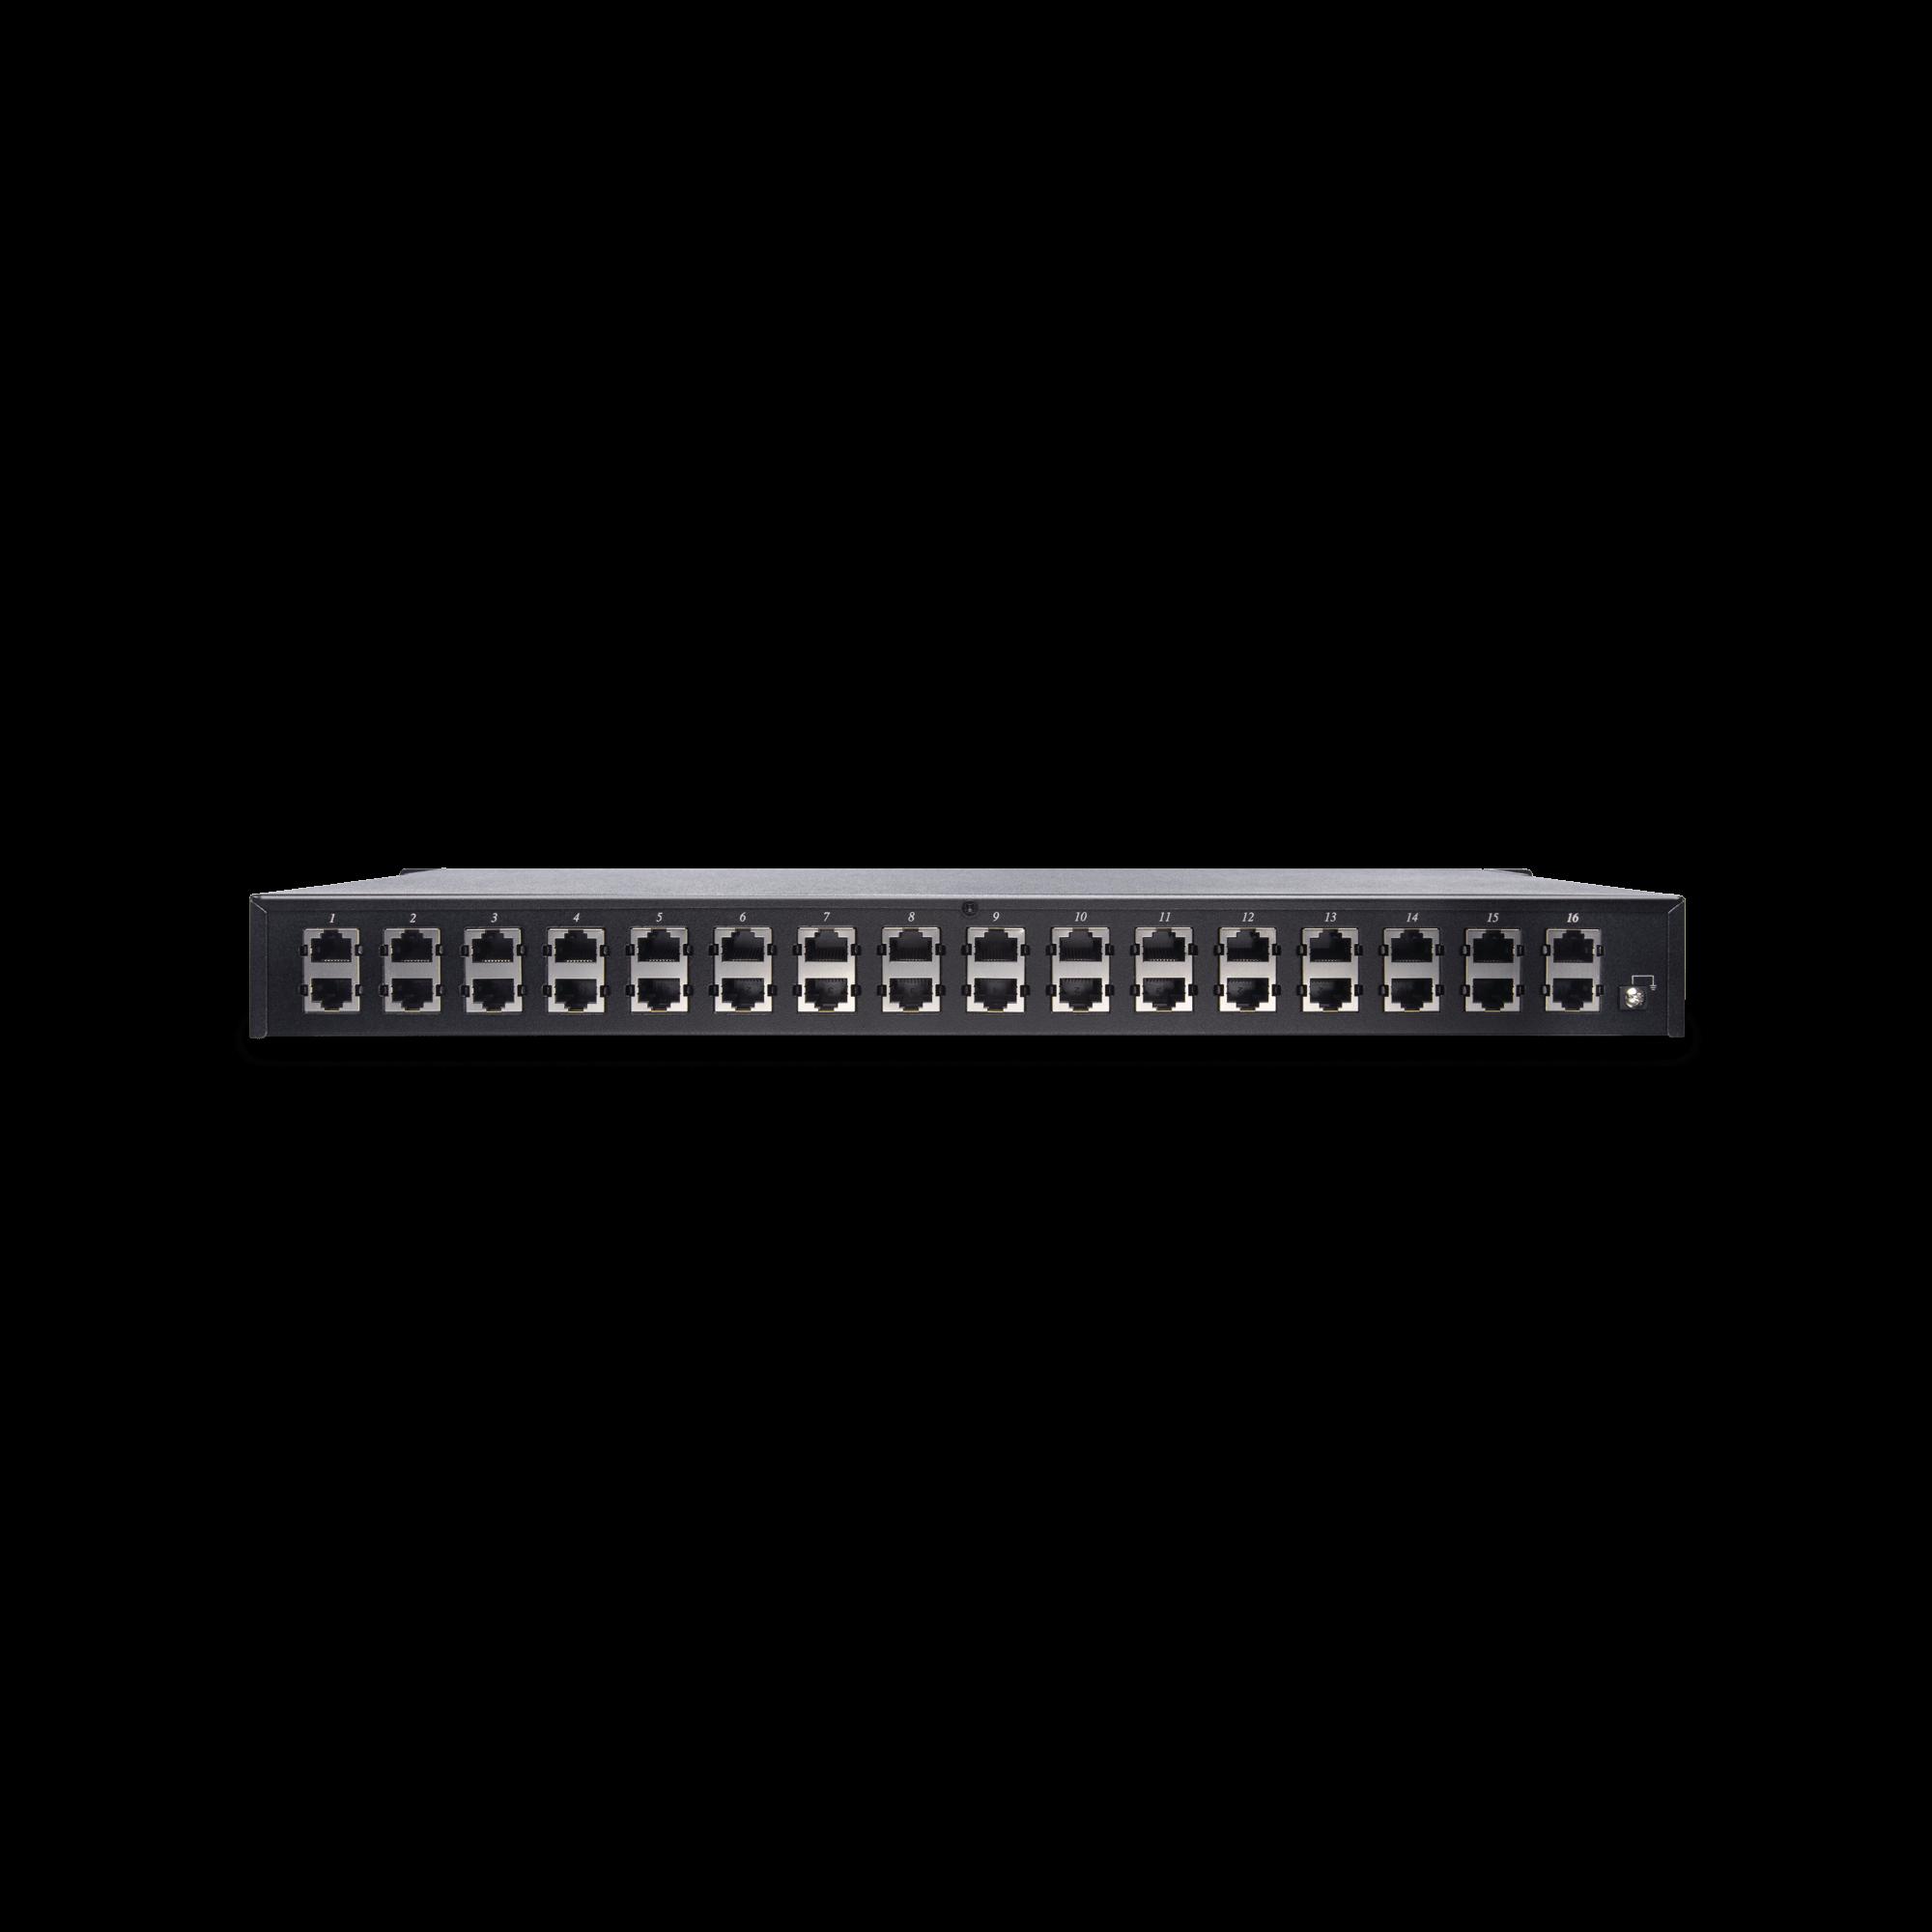 16 Channel PoE Surge Protector in 1U Rack